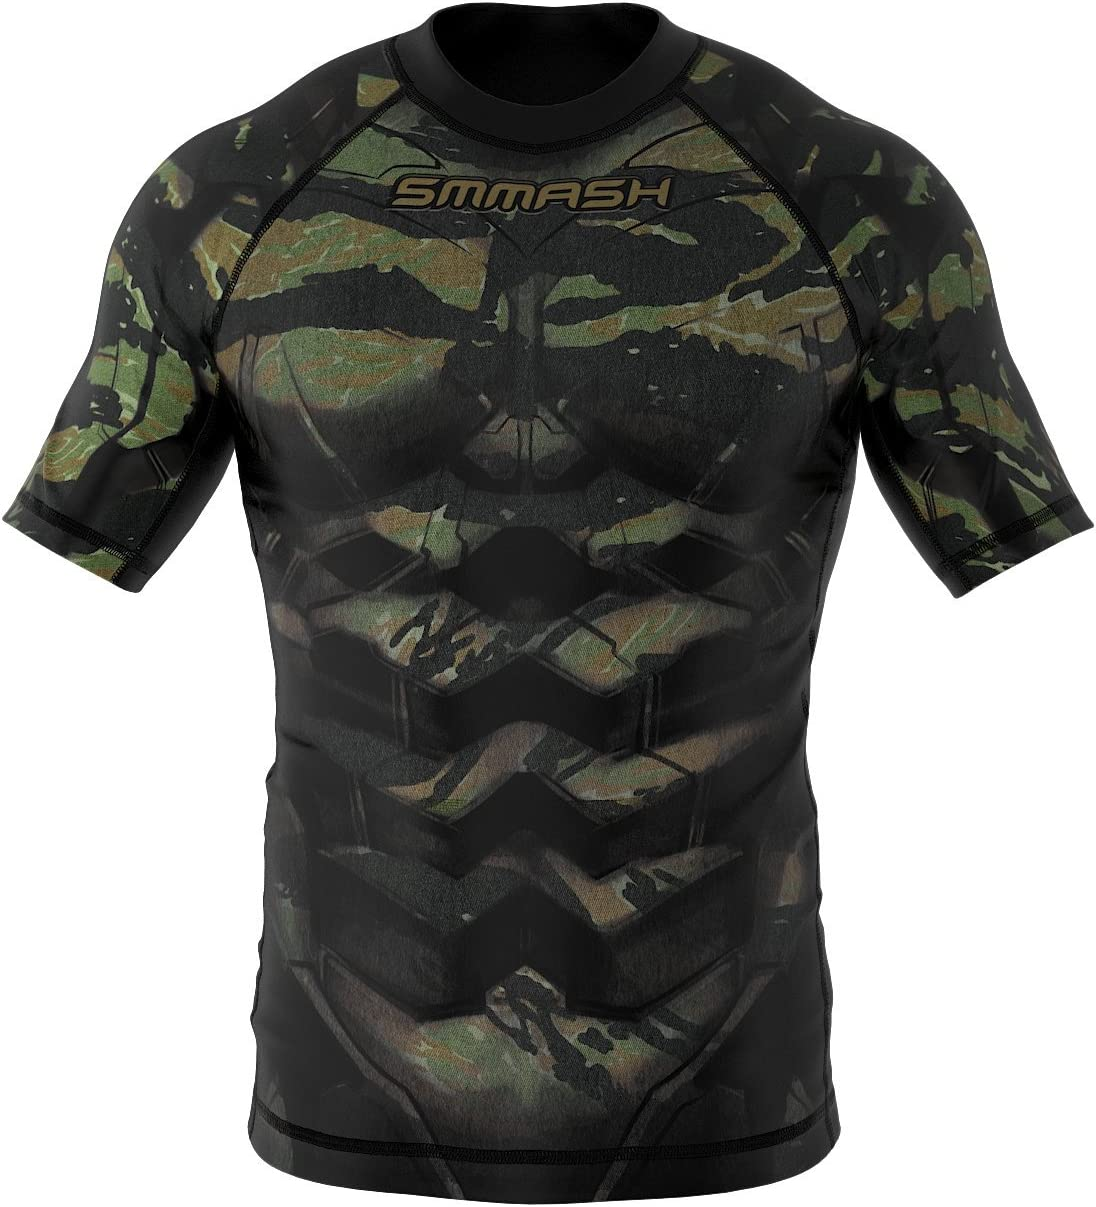 SMMASH Rashguard Tiger Armour Manche Courte MMA BJJ UFC K1